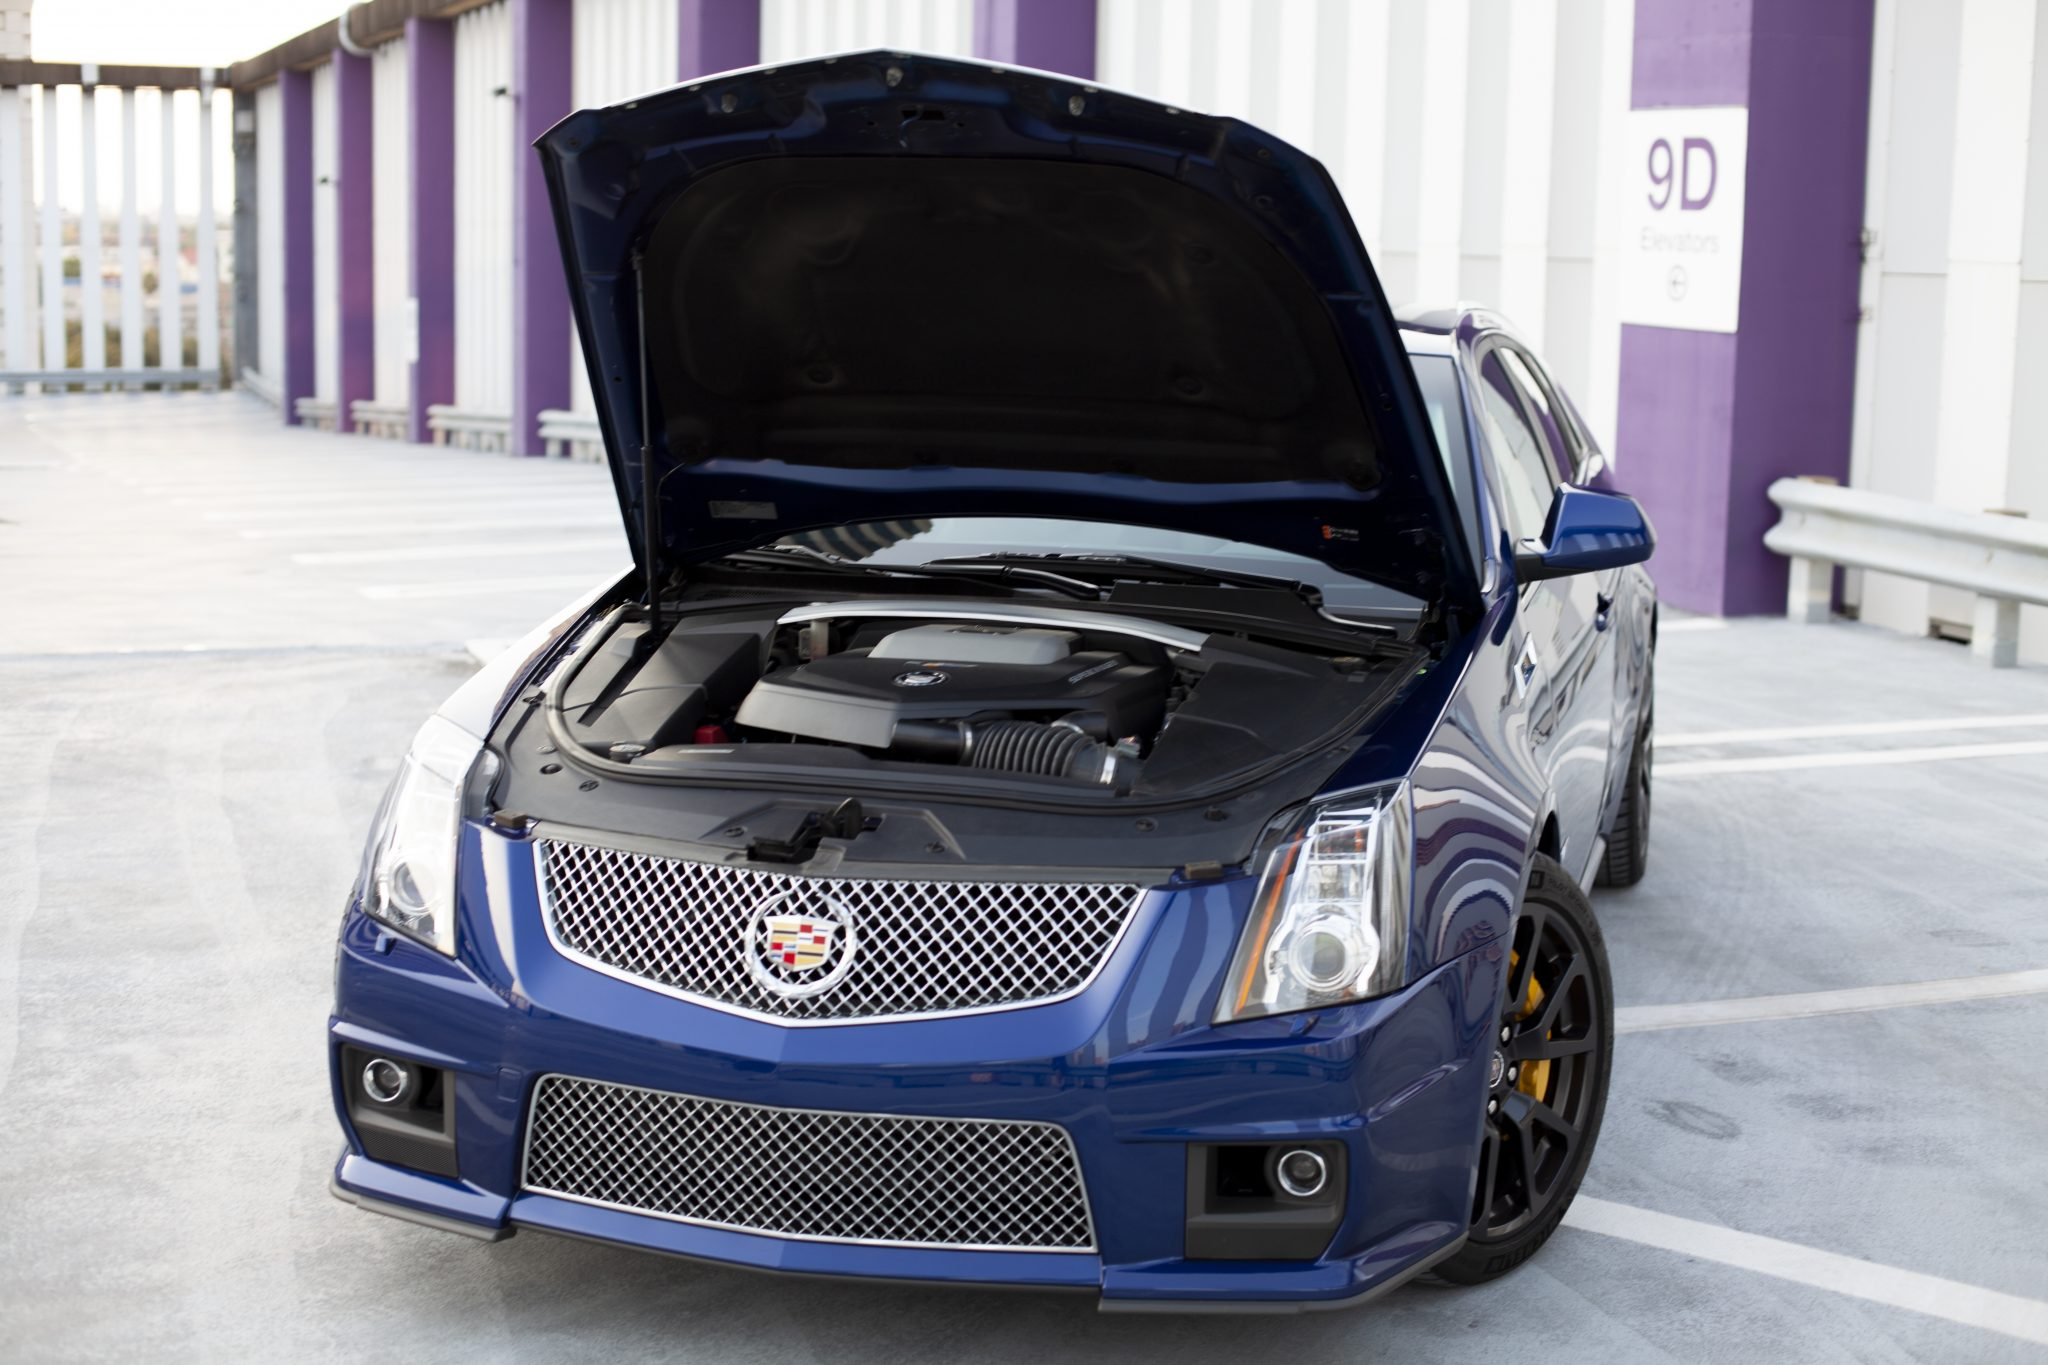 2012 Cadillac CTS-V Wagon front hood open